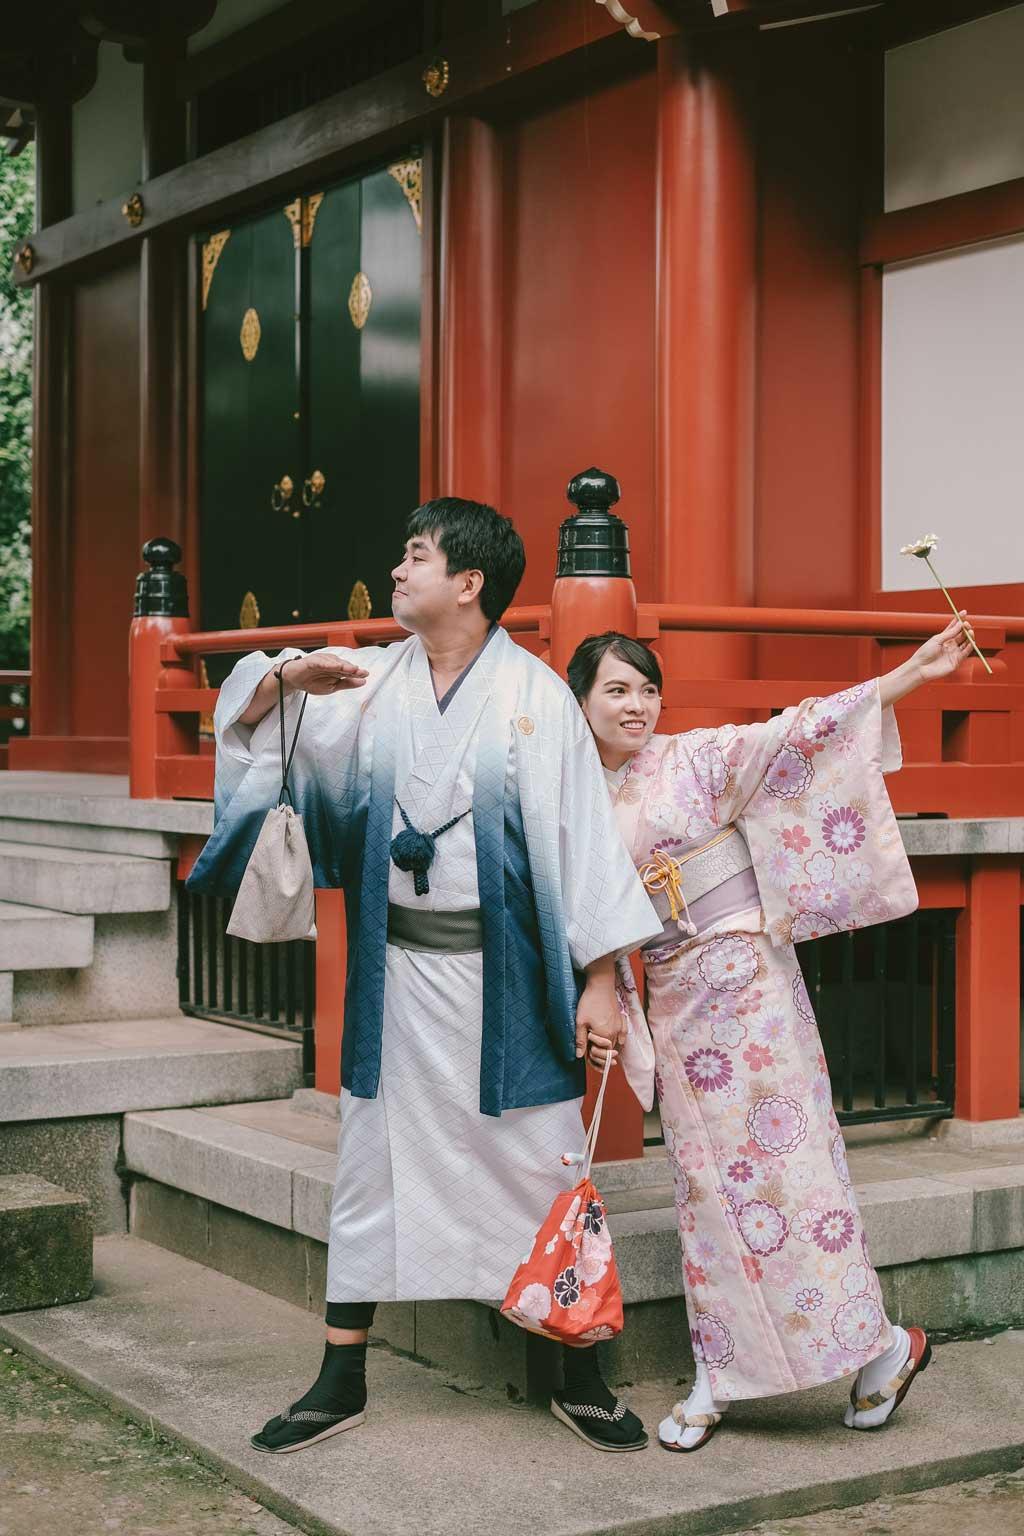 Kimono, vẻ đẹp hồn nhiên.